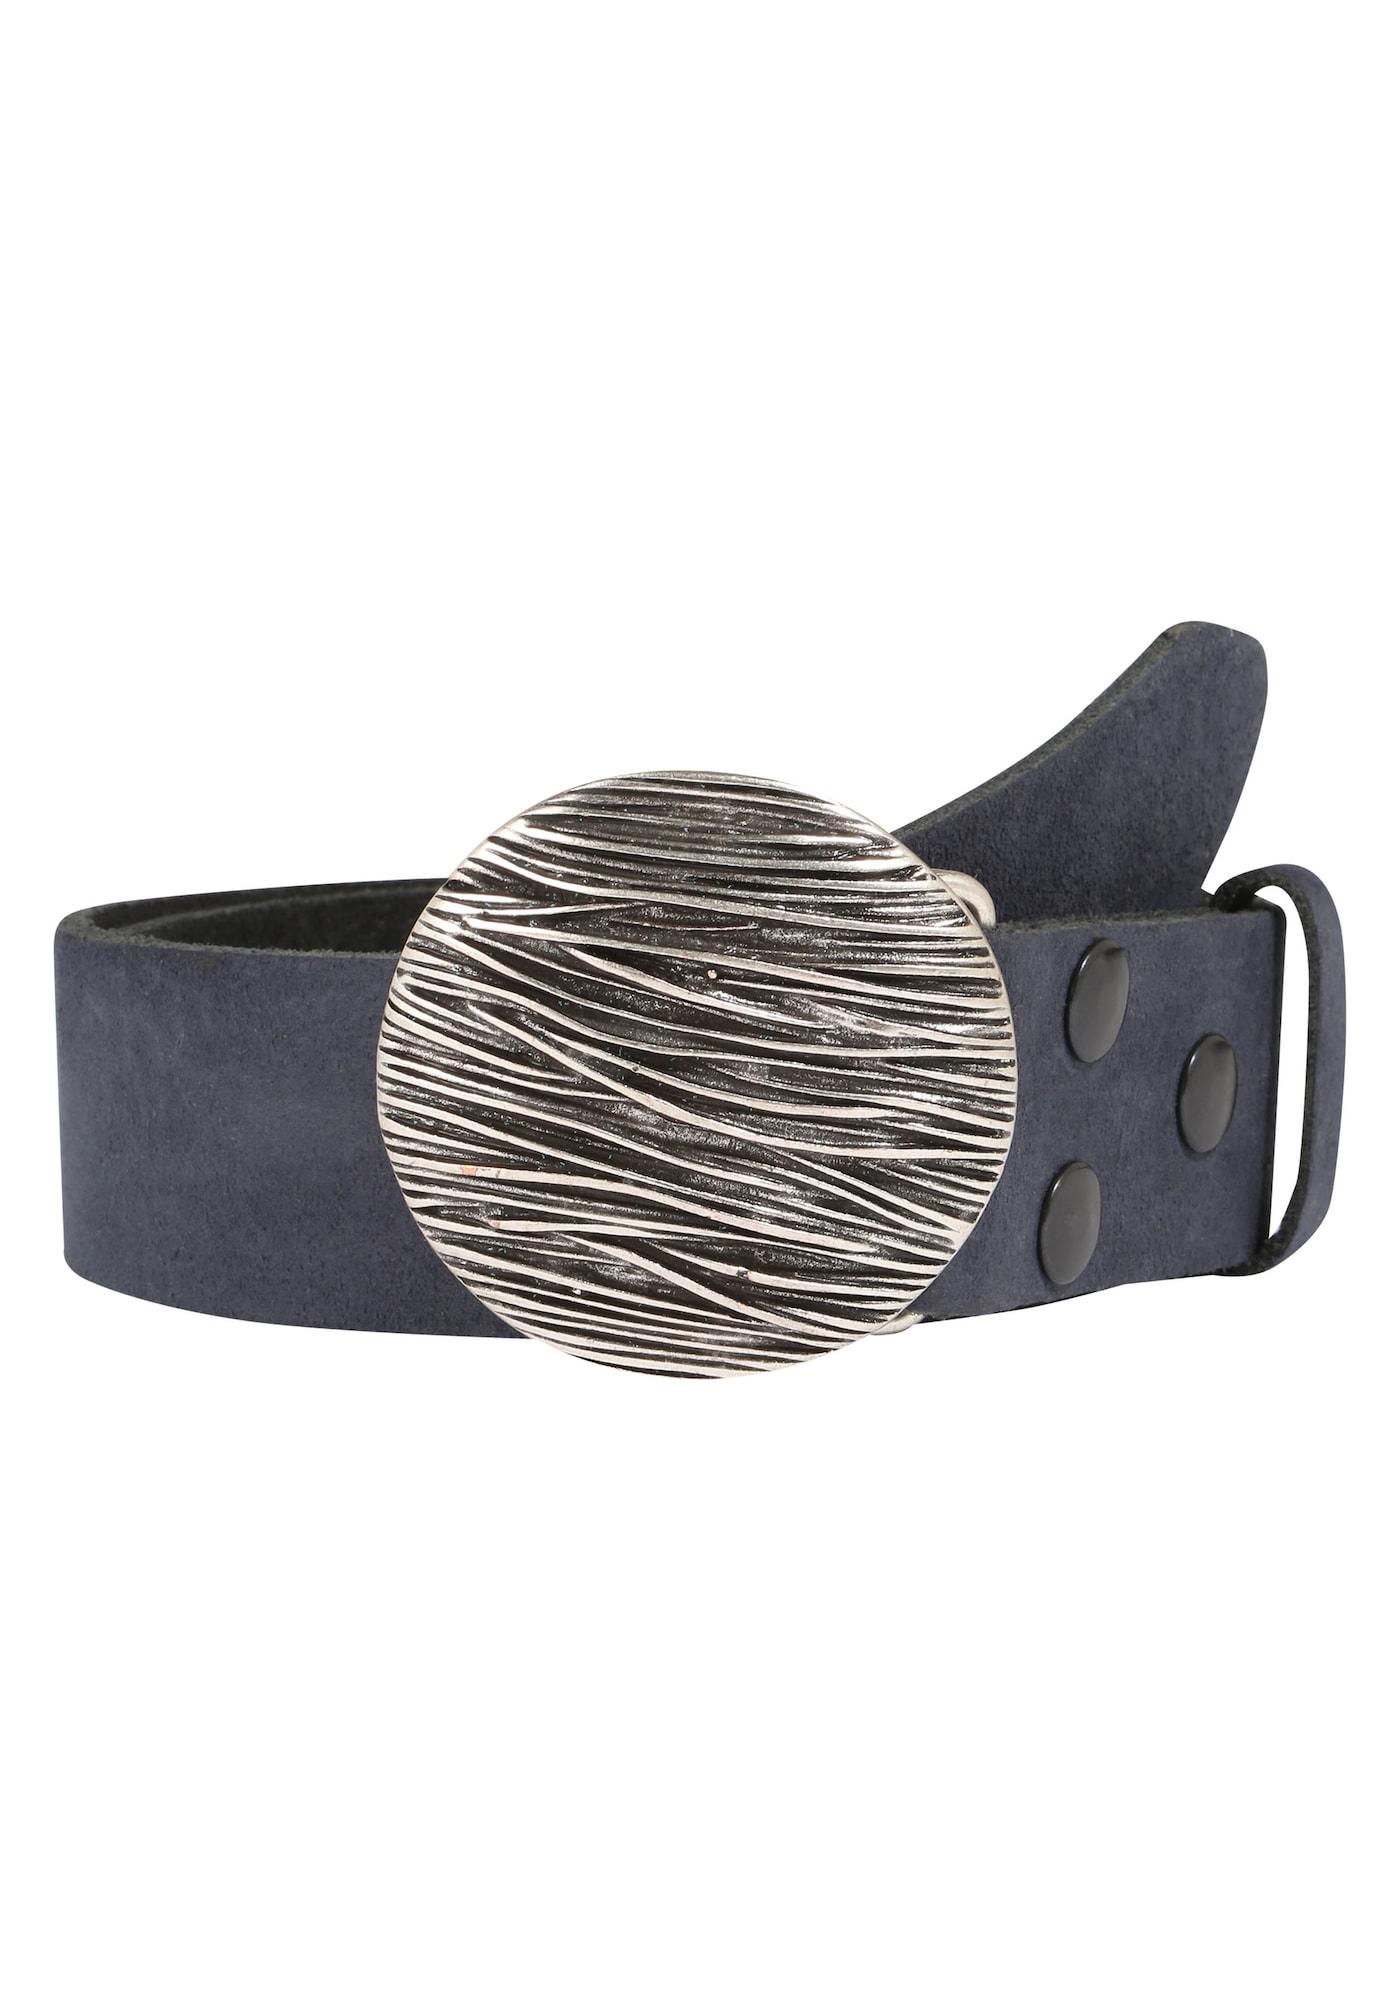 Herren RETTUNGSRING By Showroom 019° Echtledergürtel blau, blau,  rot, grau,  weiß | 04260643963285